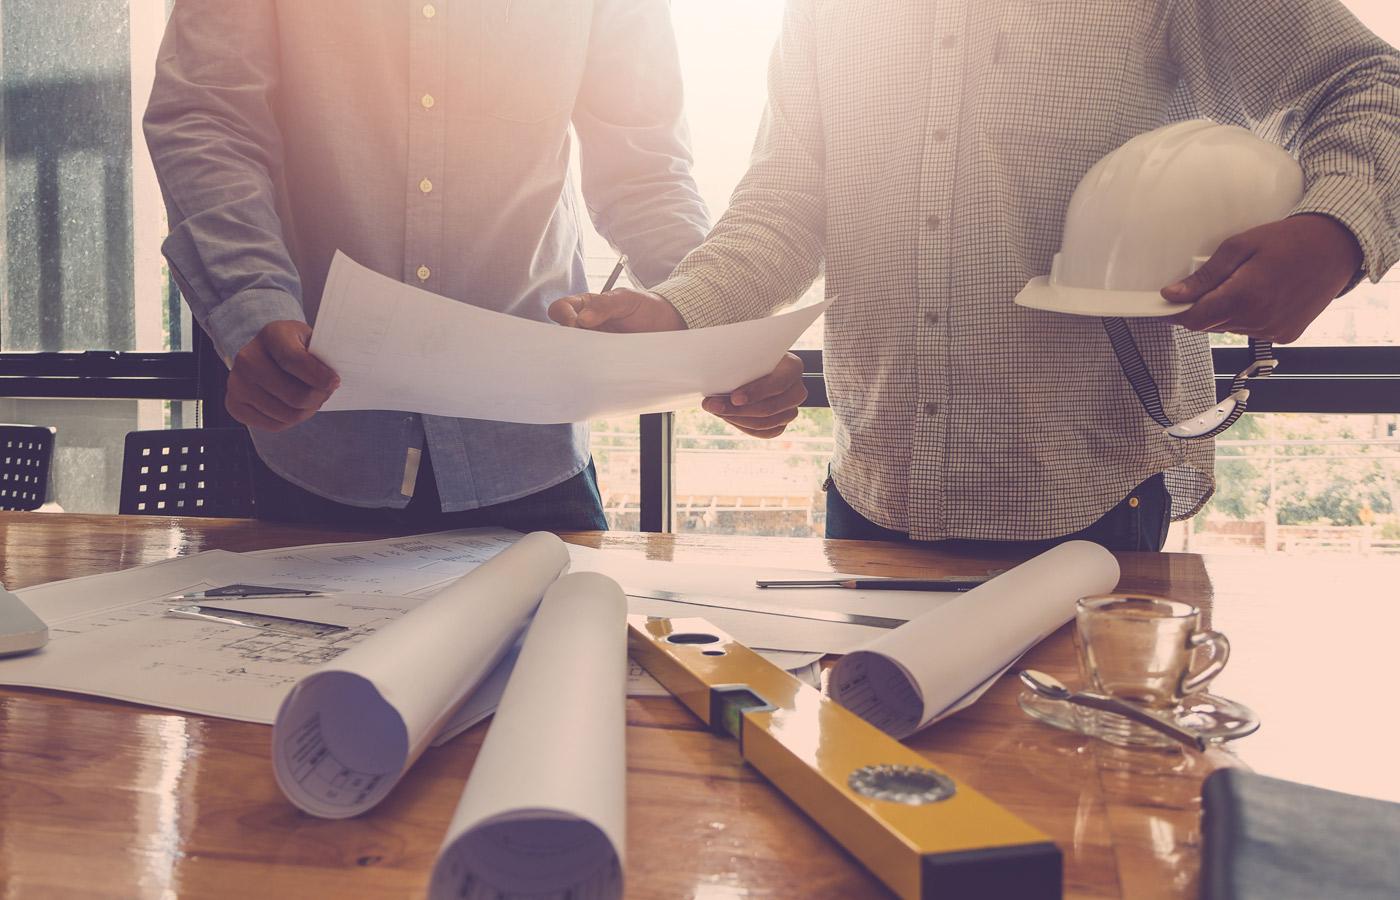 construction in Dubai is continuing